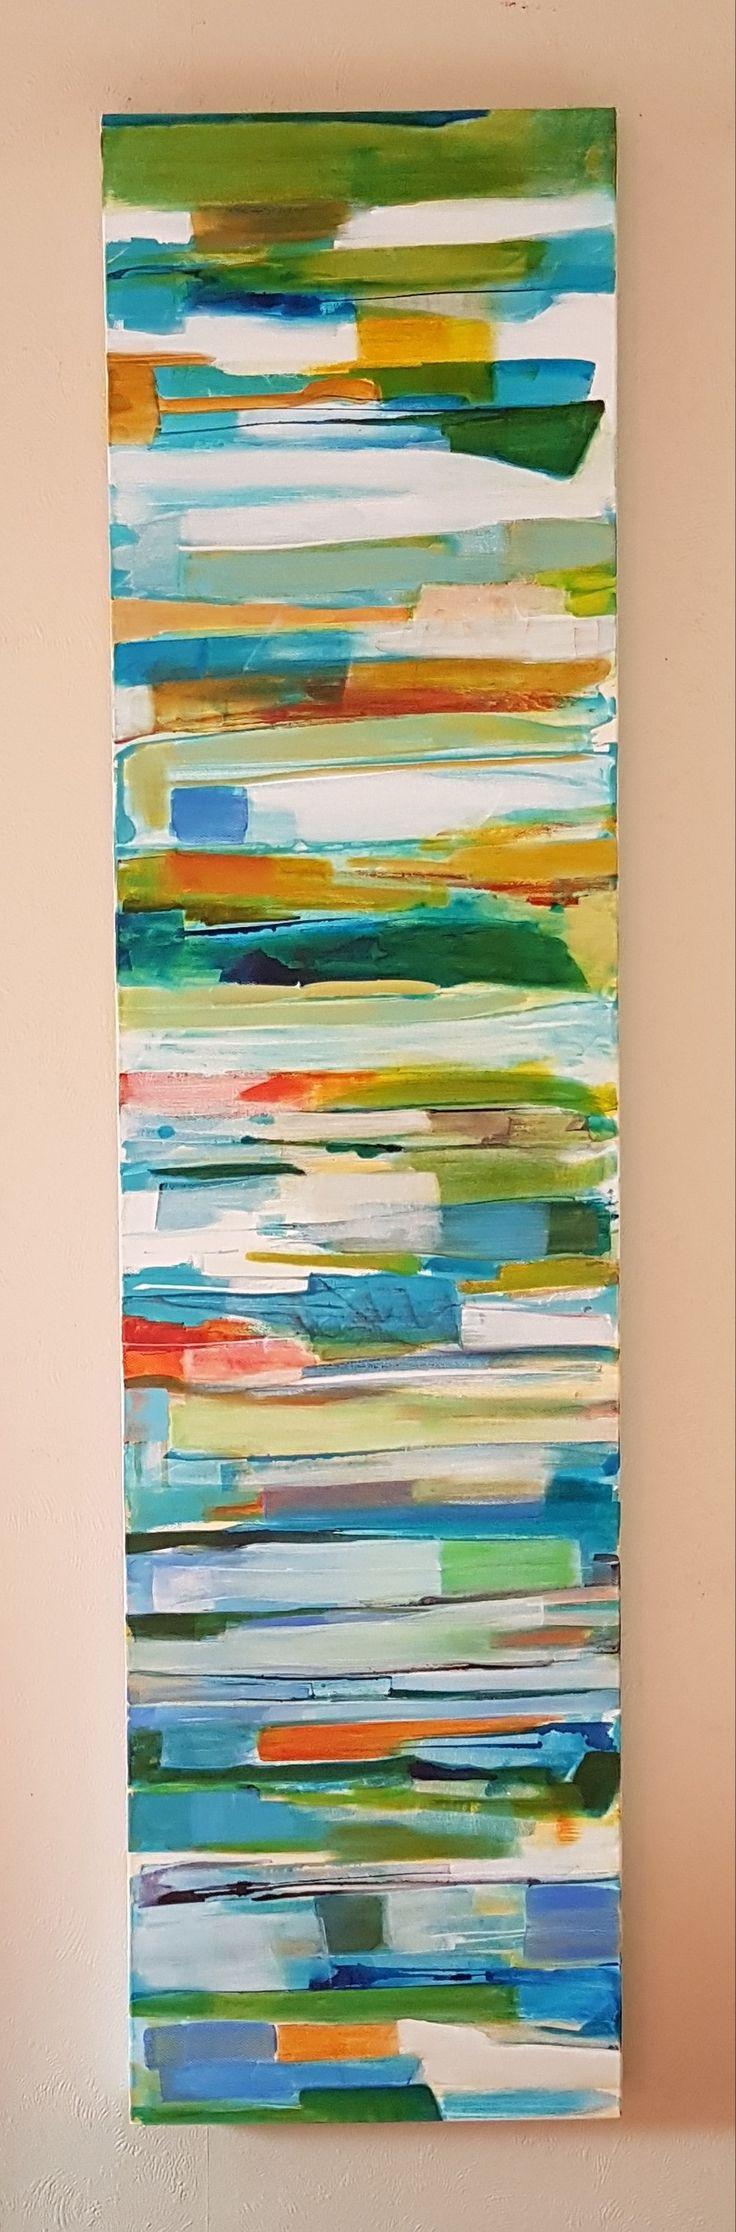 Strata painting